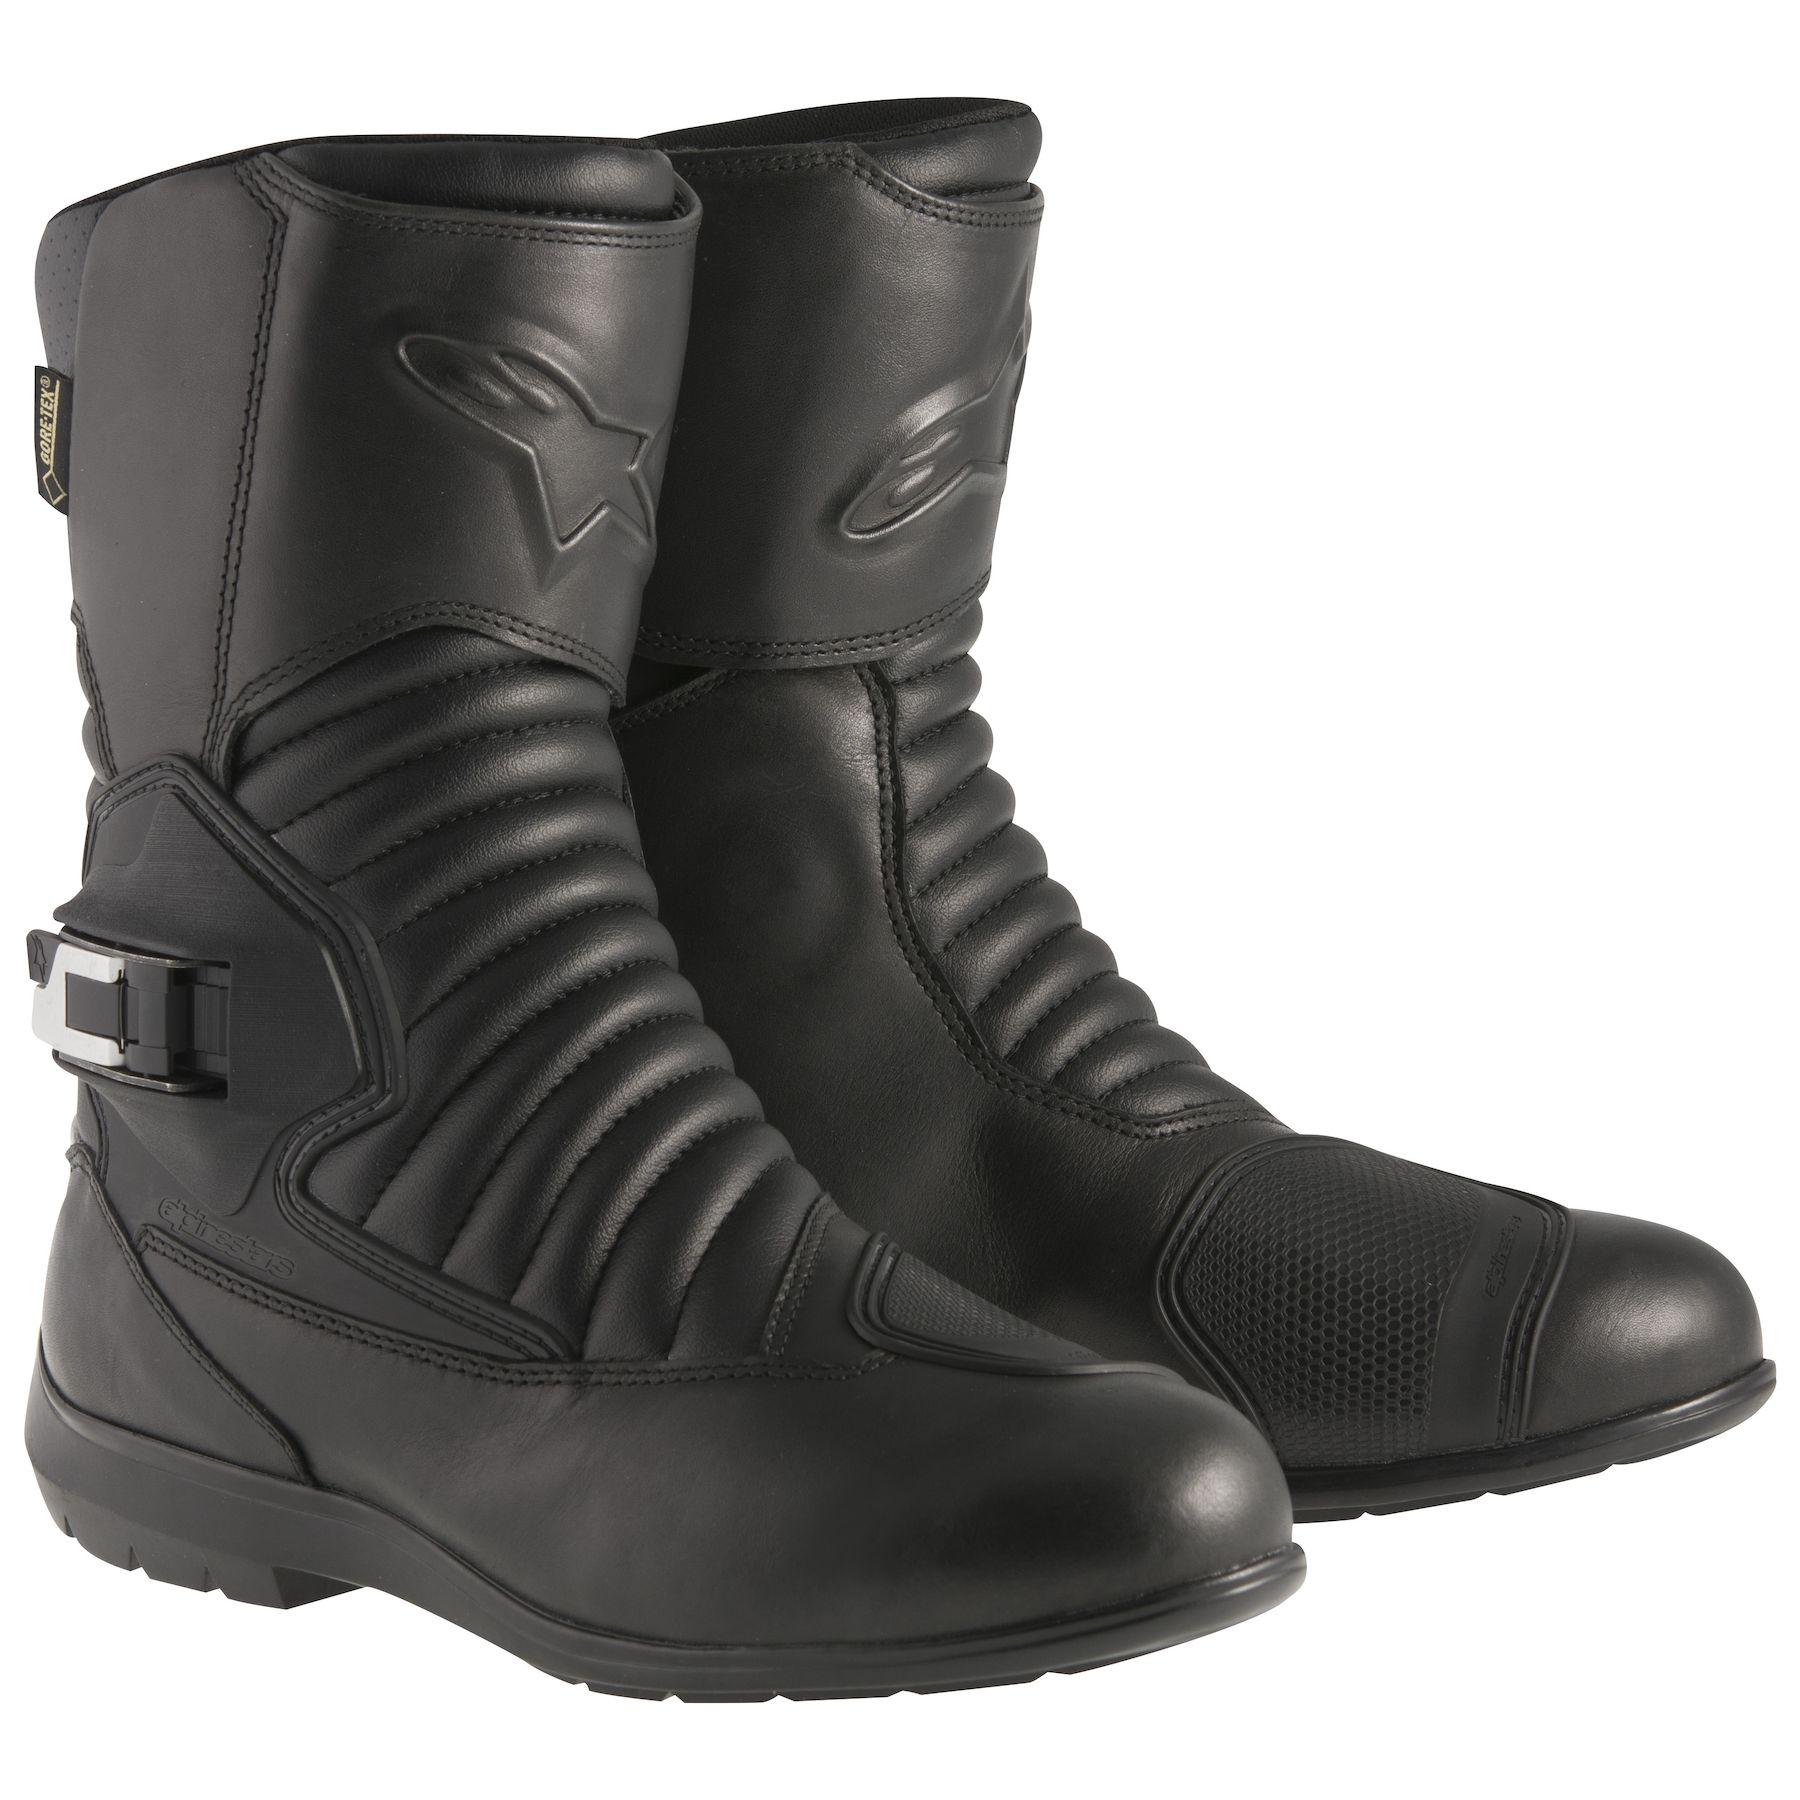 Topánky Mono Fuse Gore-Tex, ALPINESTARS (čierne)